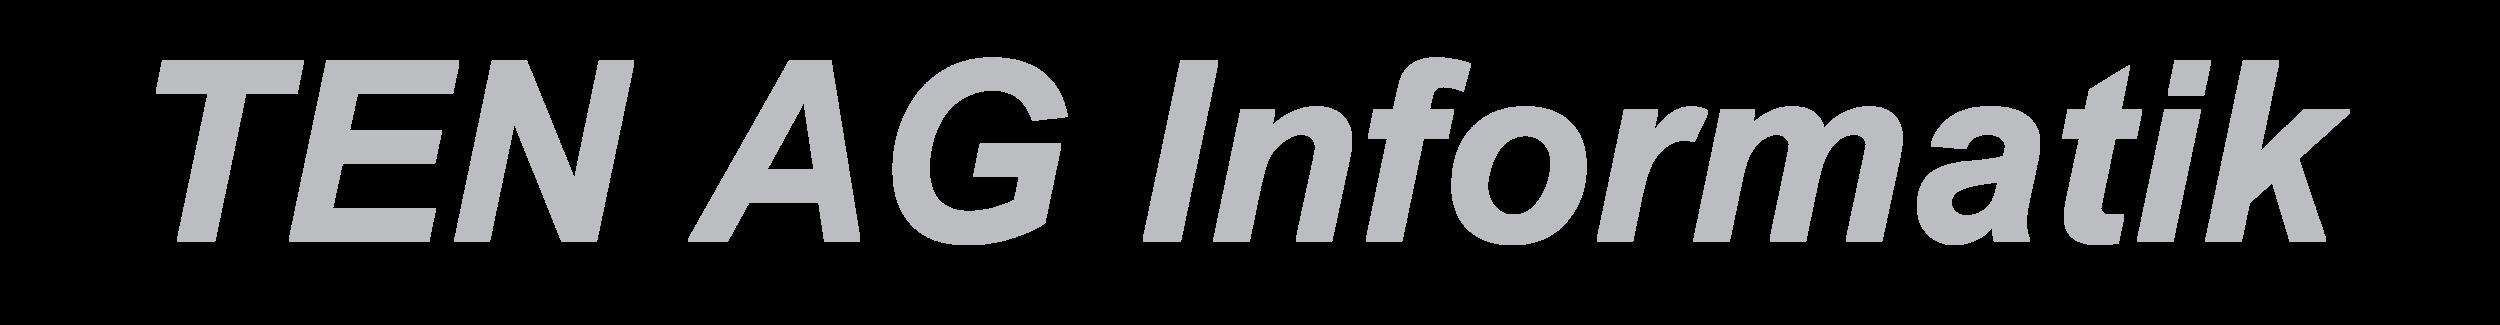 Logo-TEN-AG-Informatik-+-eventcenter-Seelisberg.png